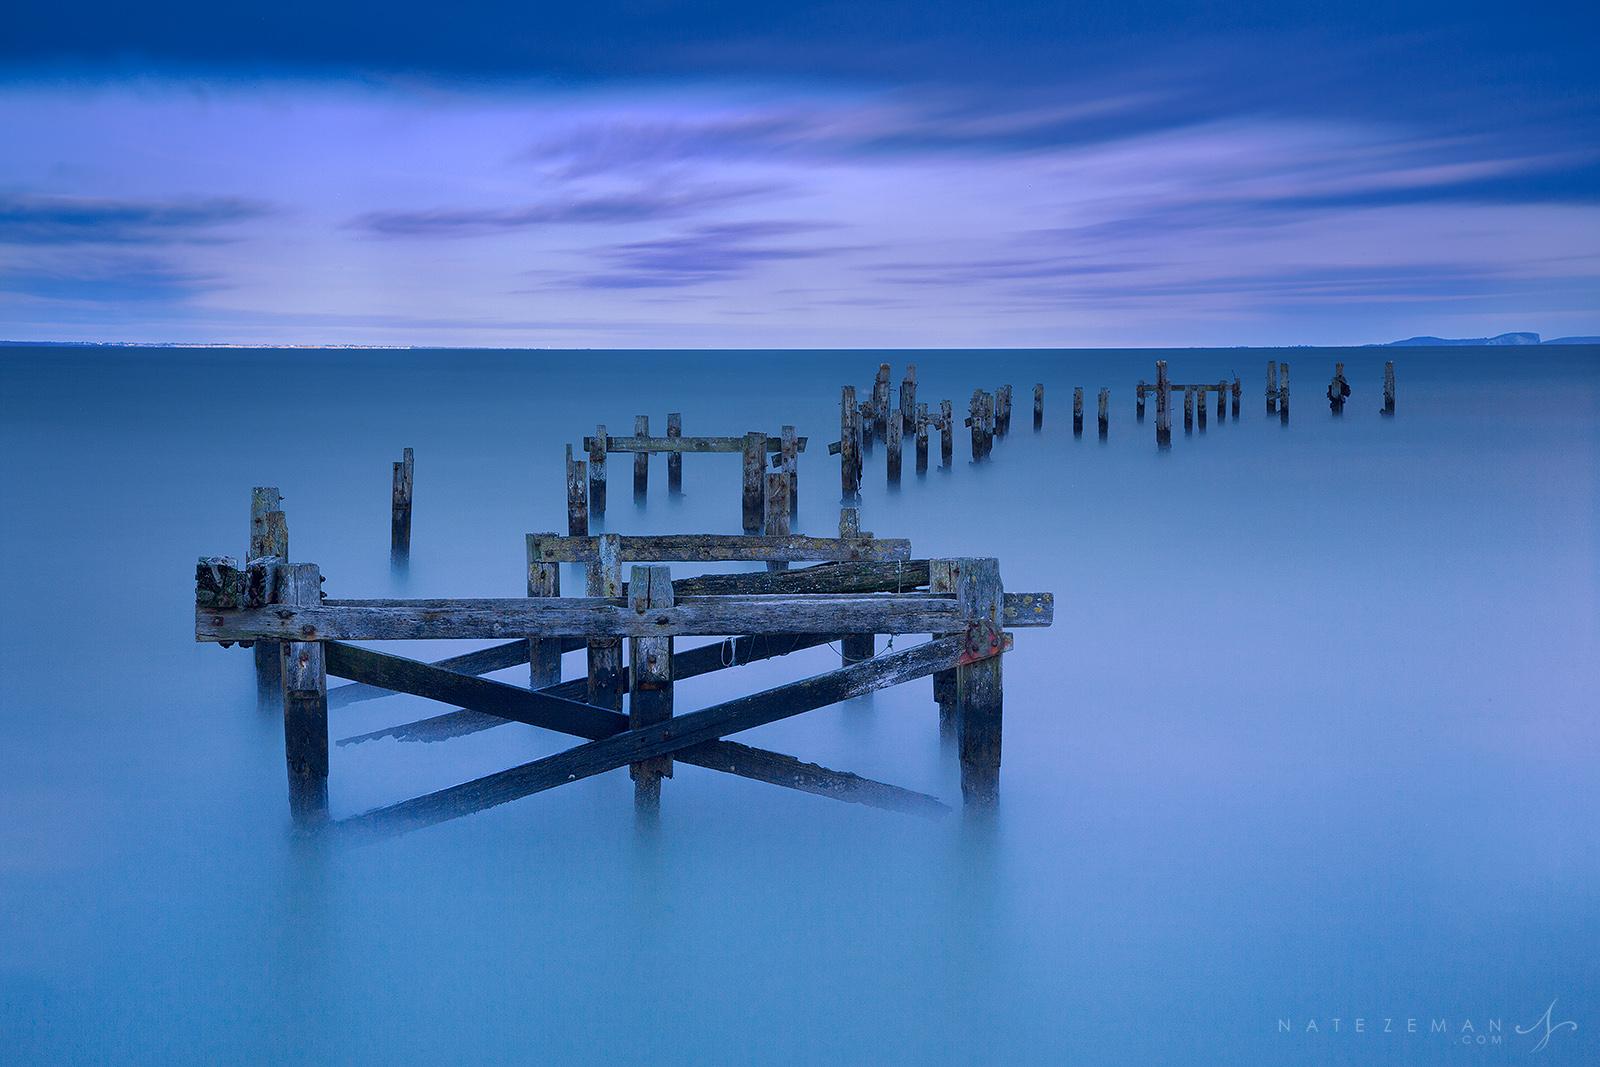 Swanage old pier, pier, long exposure, victorian, dorset, england, uk, sunset, photo